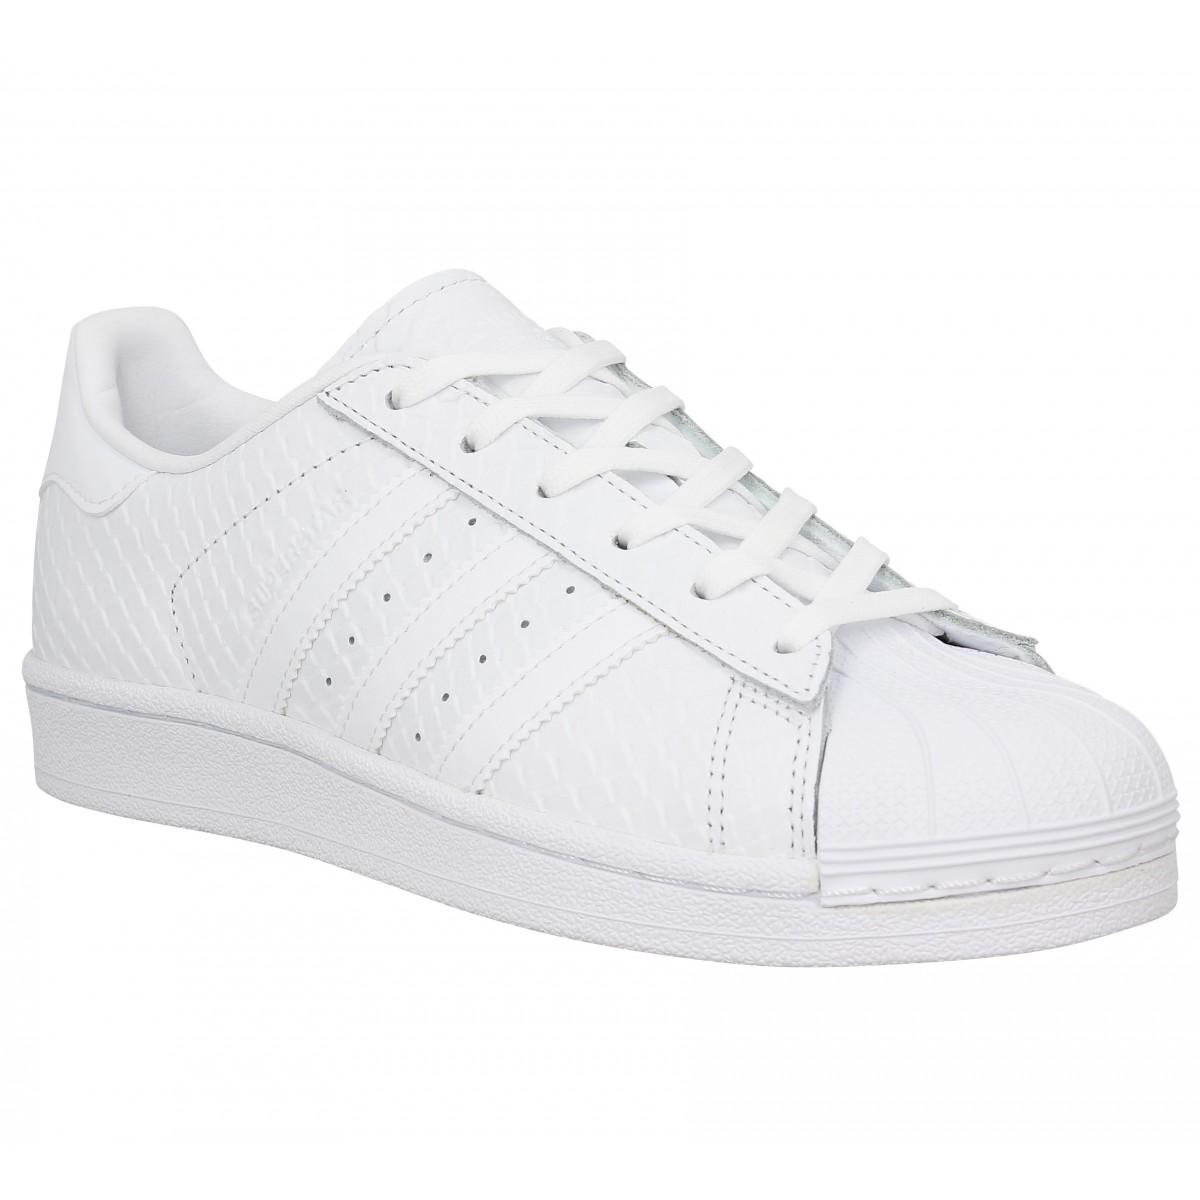 Adidas Femme Superstar Reptile-40-blanc